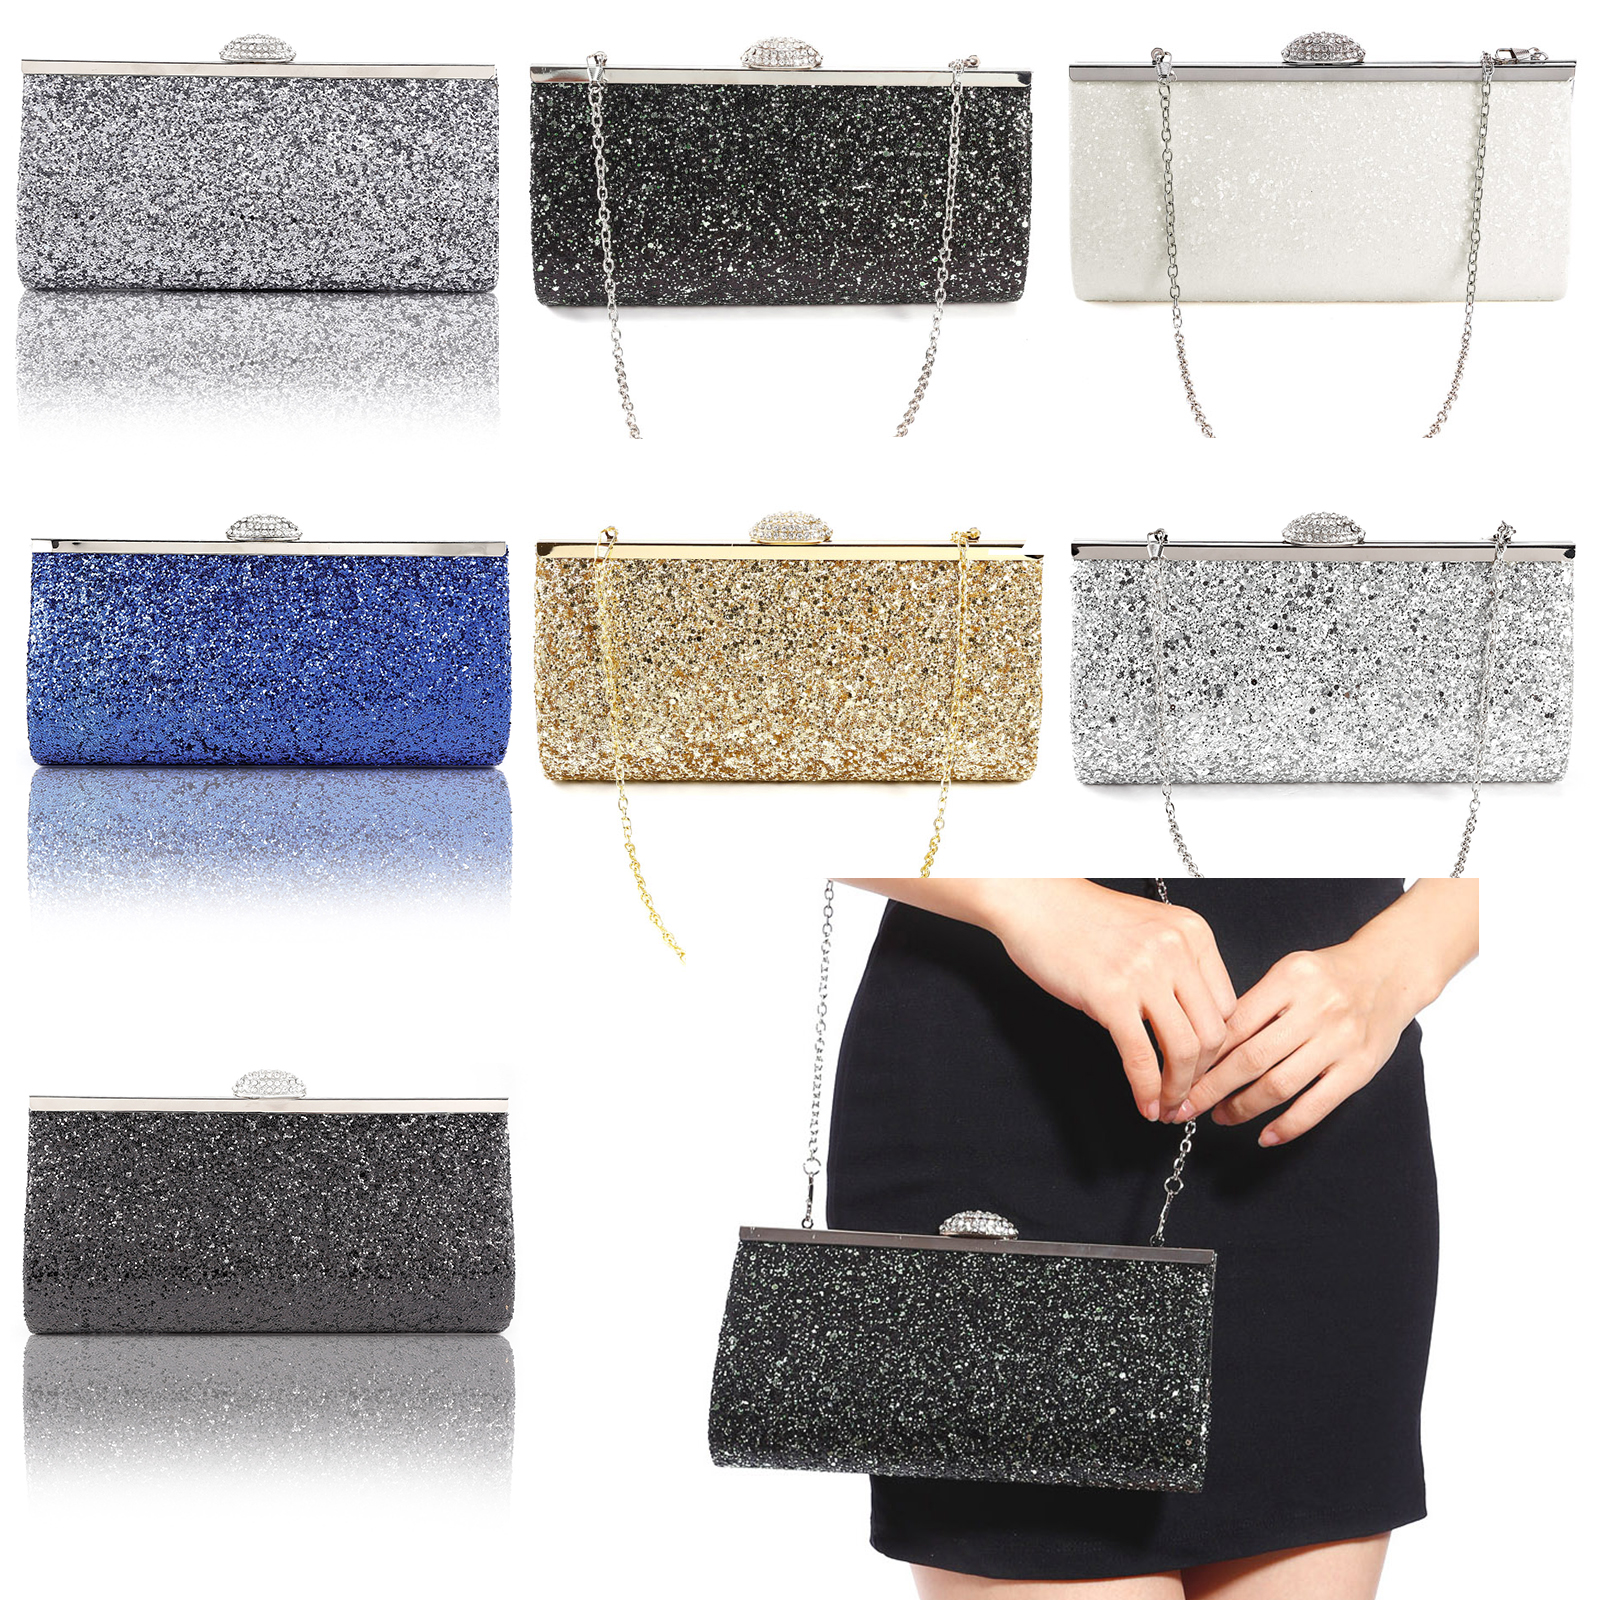 95878b9d46 Women Sparkly Glitter Clutch Bag Wedding Bridal Evening Handbag Purse 4  Colours